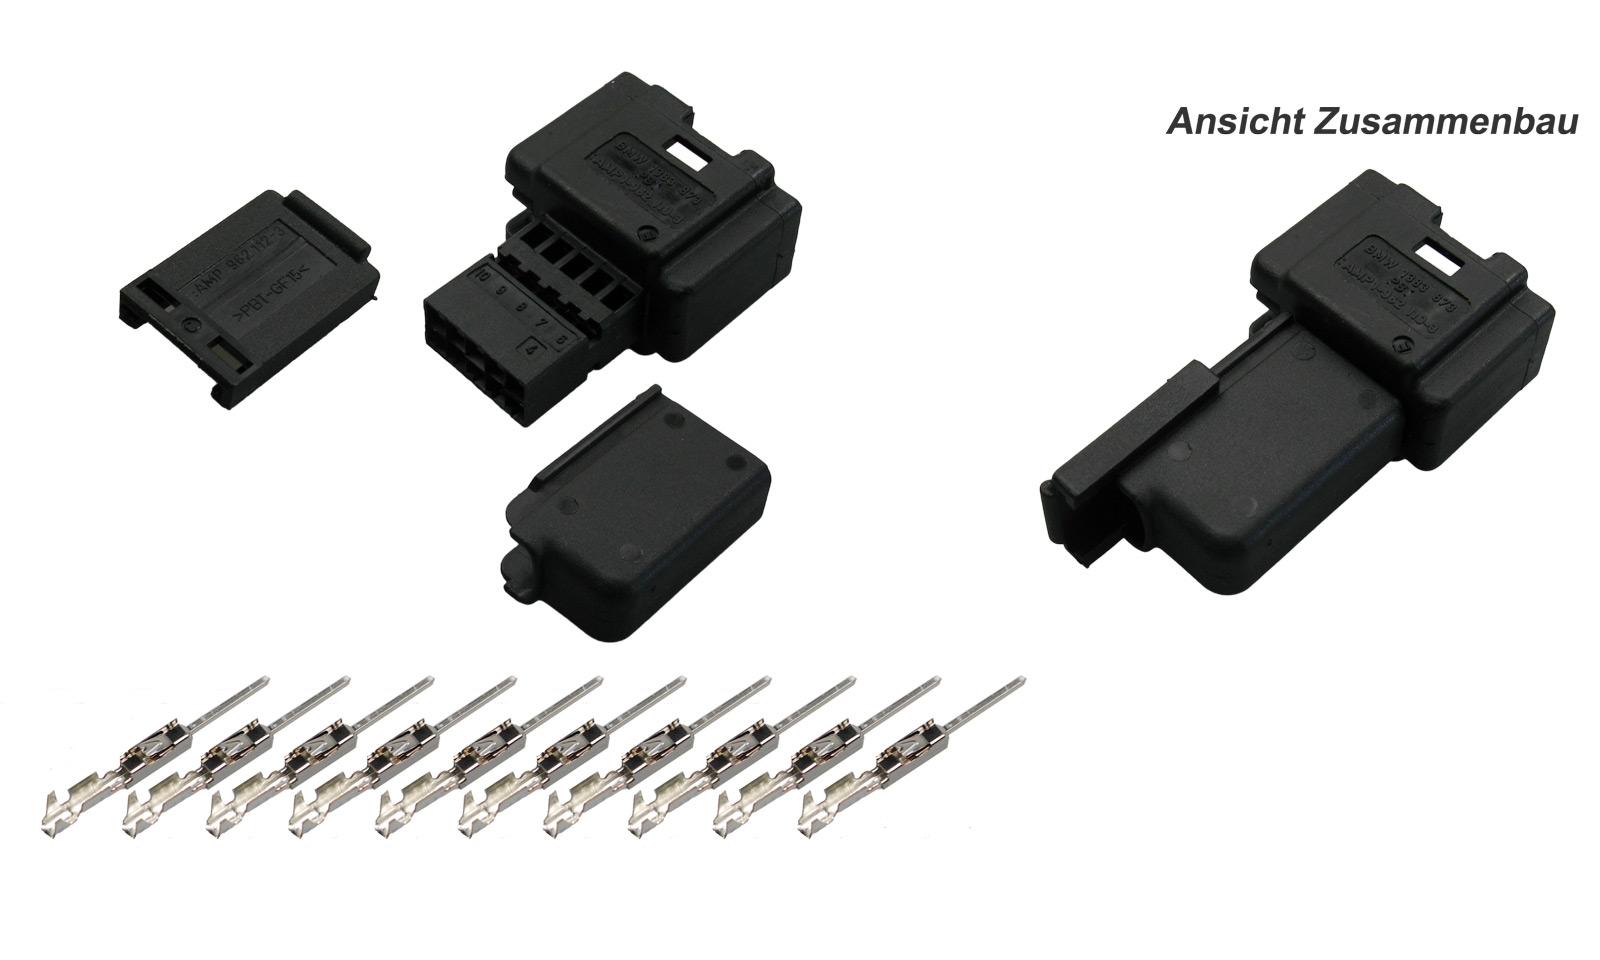 nett kabelschuhe stecker galerie schaltplan serie circuit collection. Black Bedroom Furniture Sets. Home Design Ideas